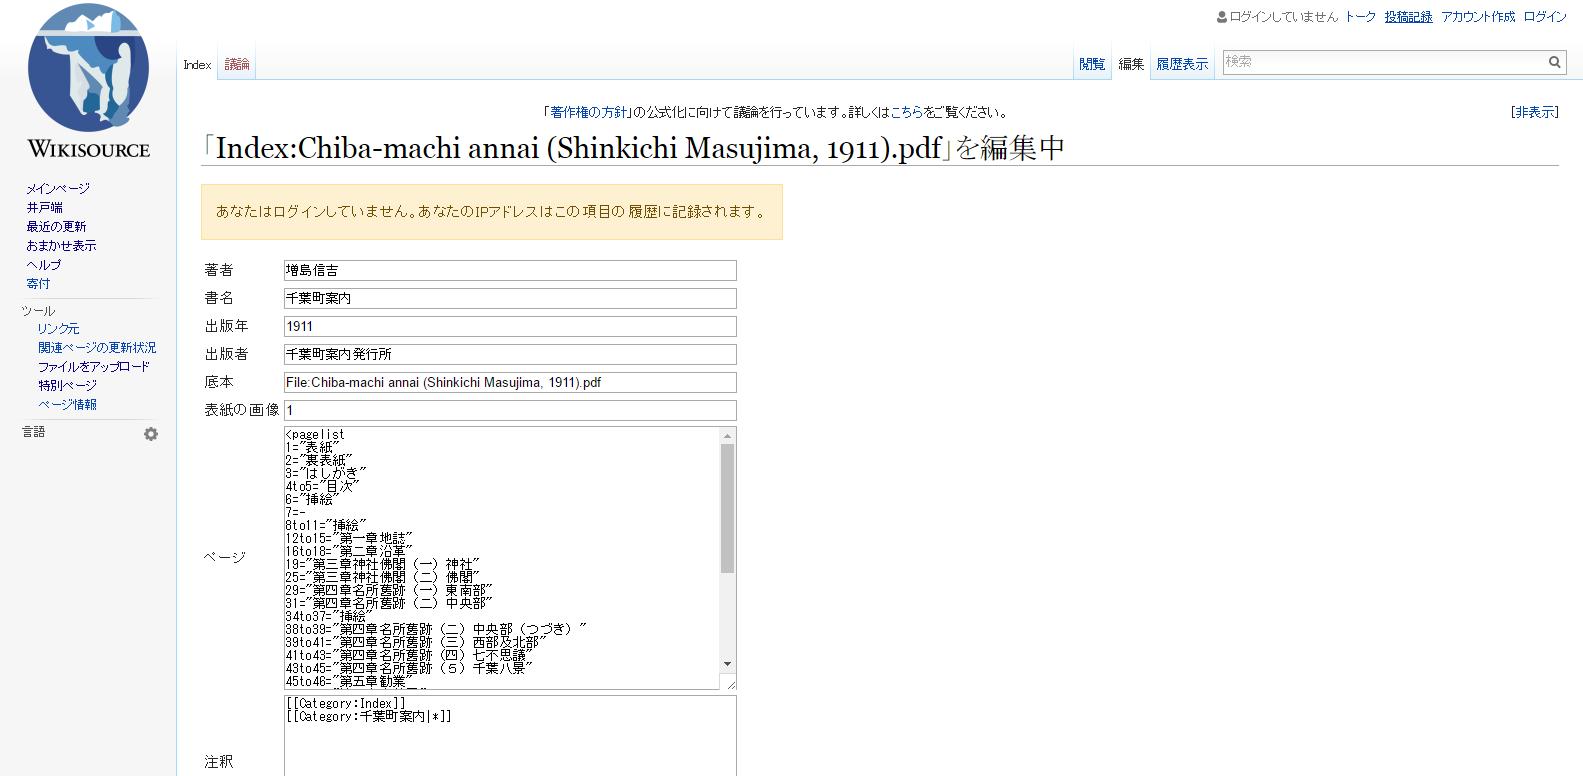 「Index Chiba machi annai  Shinkichi Masujima  1911 .pdf」を編集中   Wikisource.png